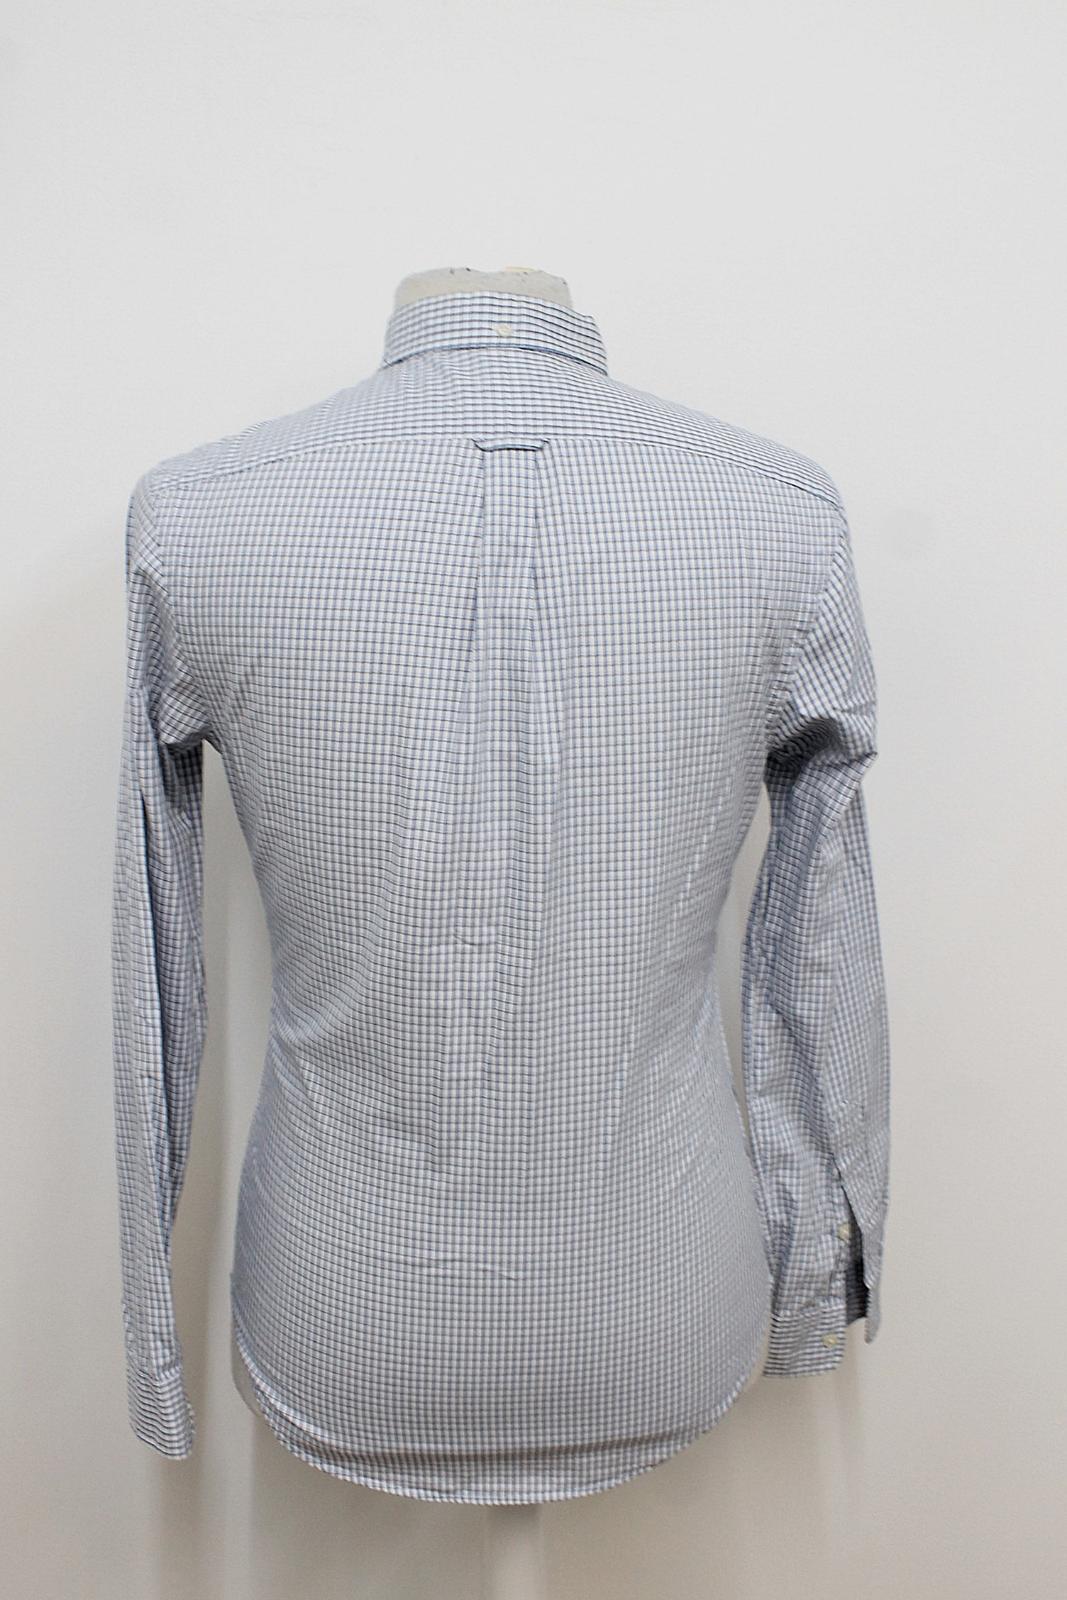 Polo-Ralph-Lauren-Para-Hombres-Blanco-Negro-Azul-Camisa-De-Patron-De-Cuadros-Slim-Fit-Talla-S miniatura 4